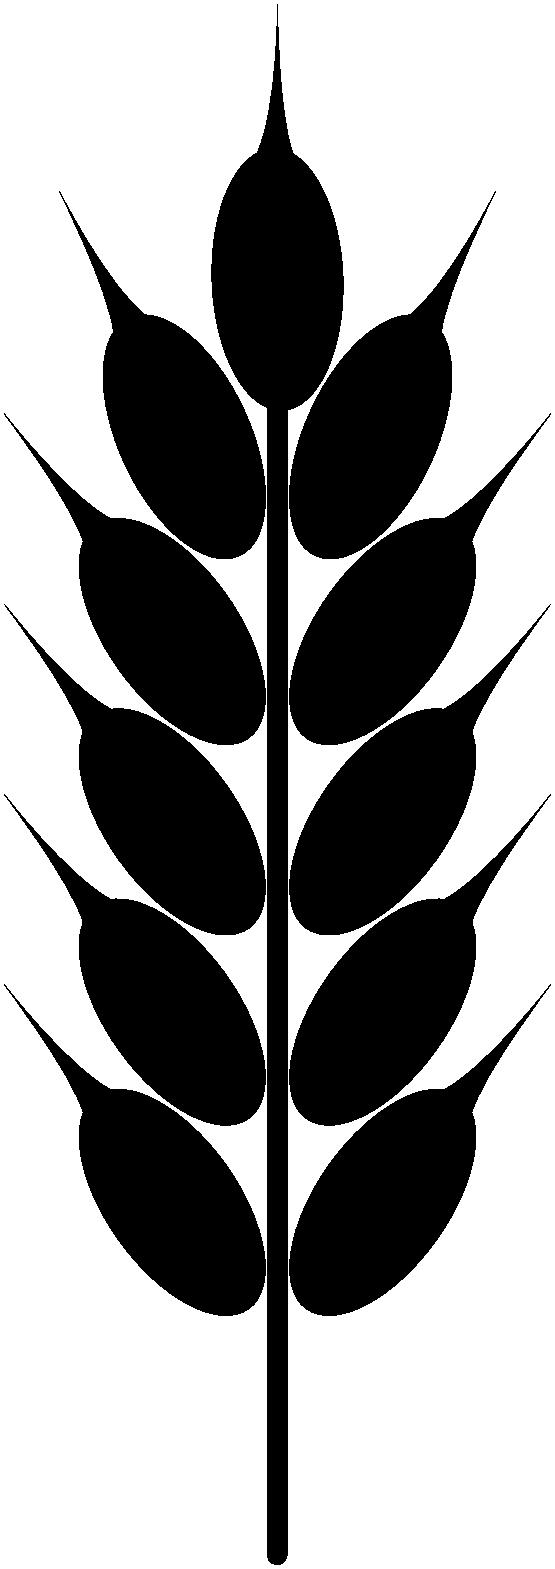 Pumpkin bread clipart black and white outline svg Clipart: Wheat Black And White | Farm and animals | Pinterest ... svg